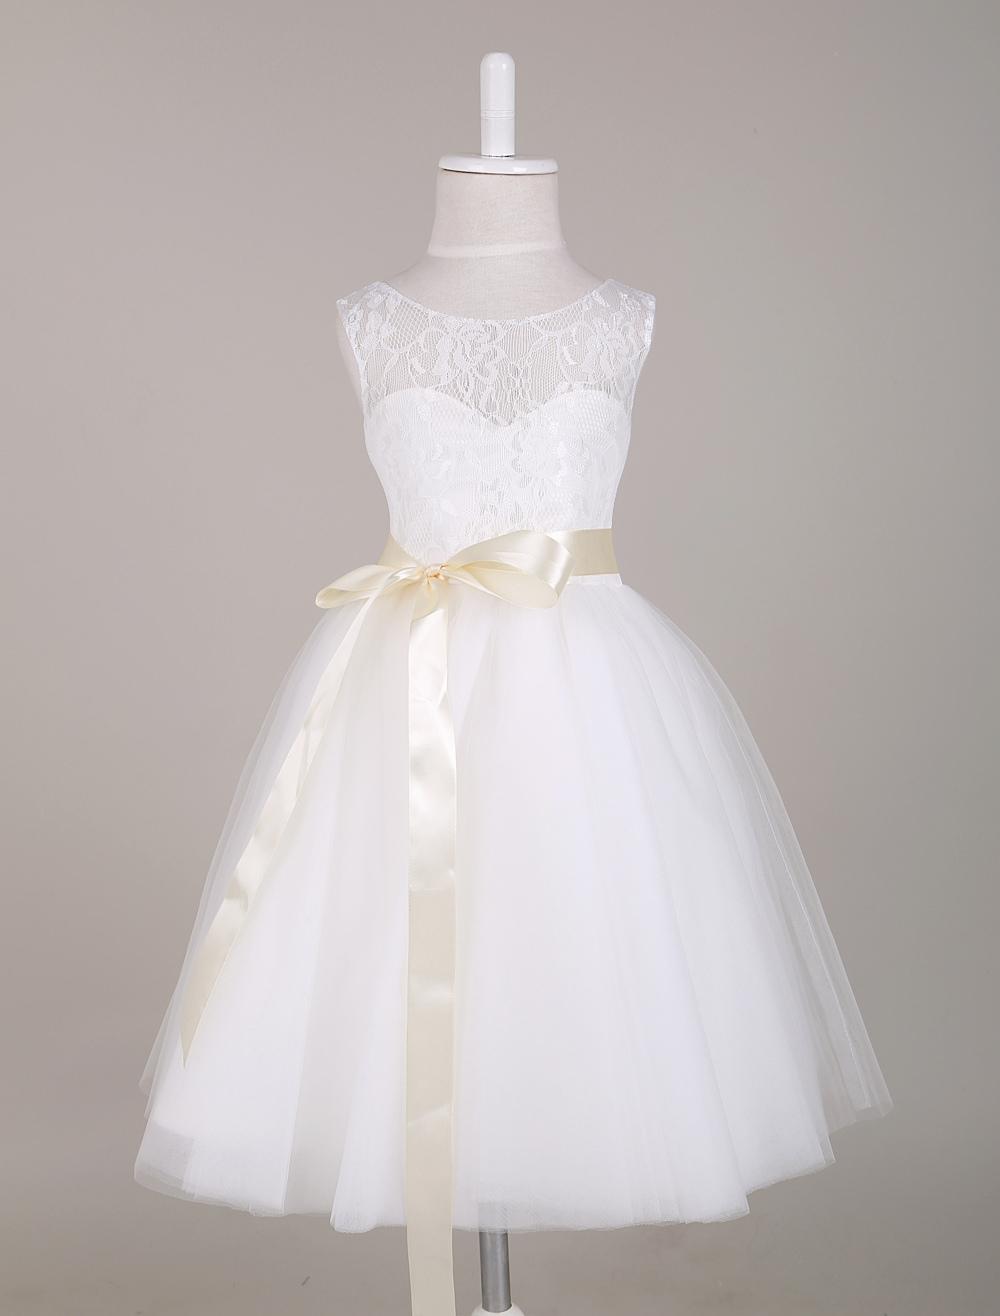 White Flower Girl Dress Princess Lace Illusion Sweetheart Neckline Ribbon Bow Sash Knee Length Short Kids Party Dresses